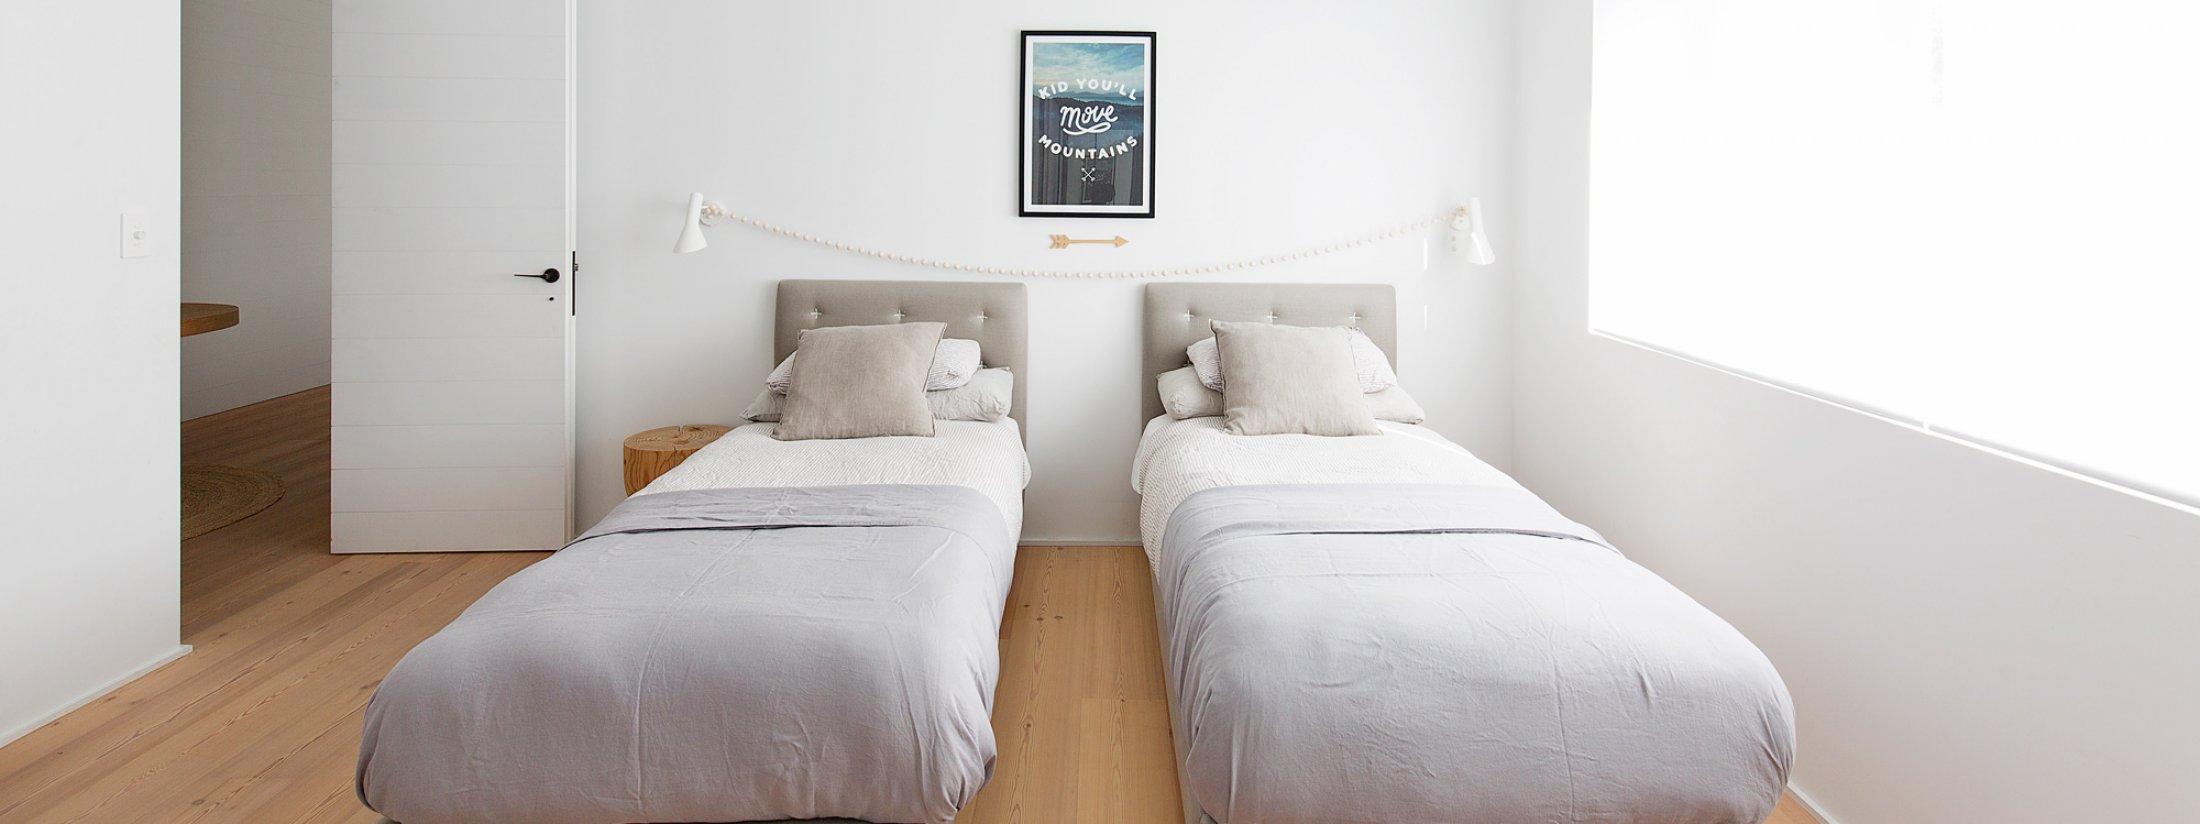 Coonanga Beach House - Avalon - Twin Room